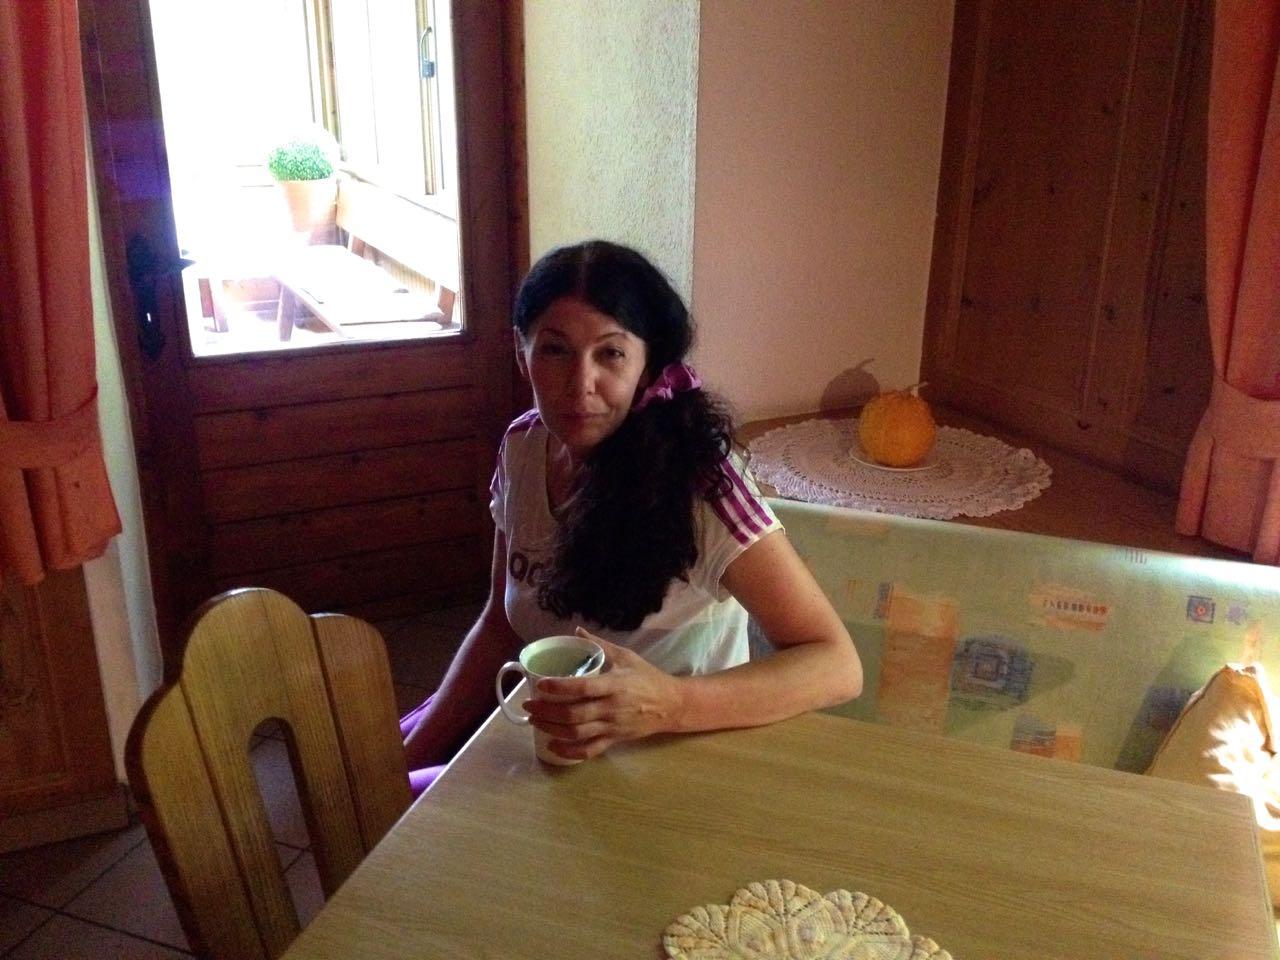 Jannis_Life_Anekdote_Gutes_tun